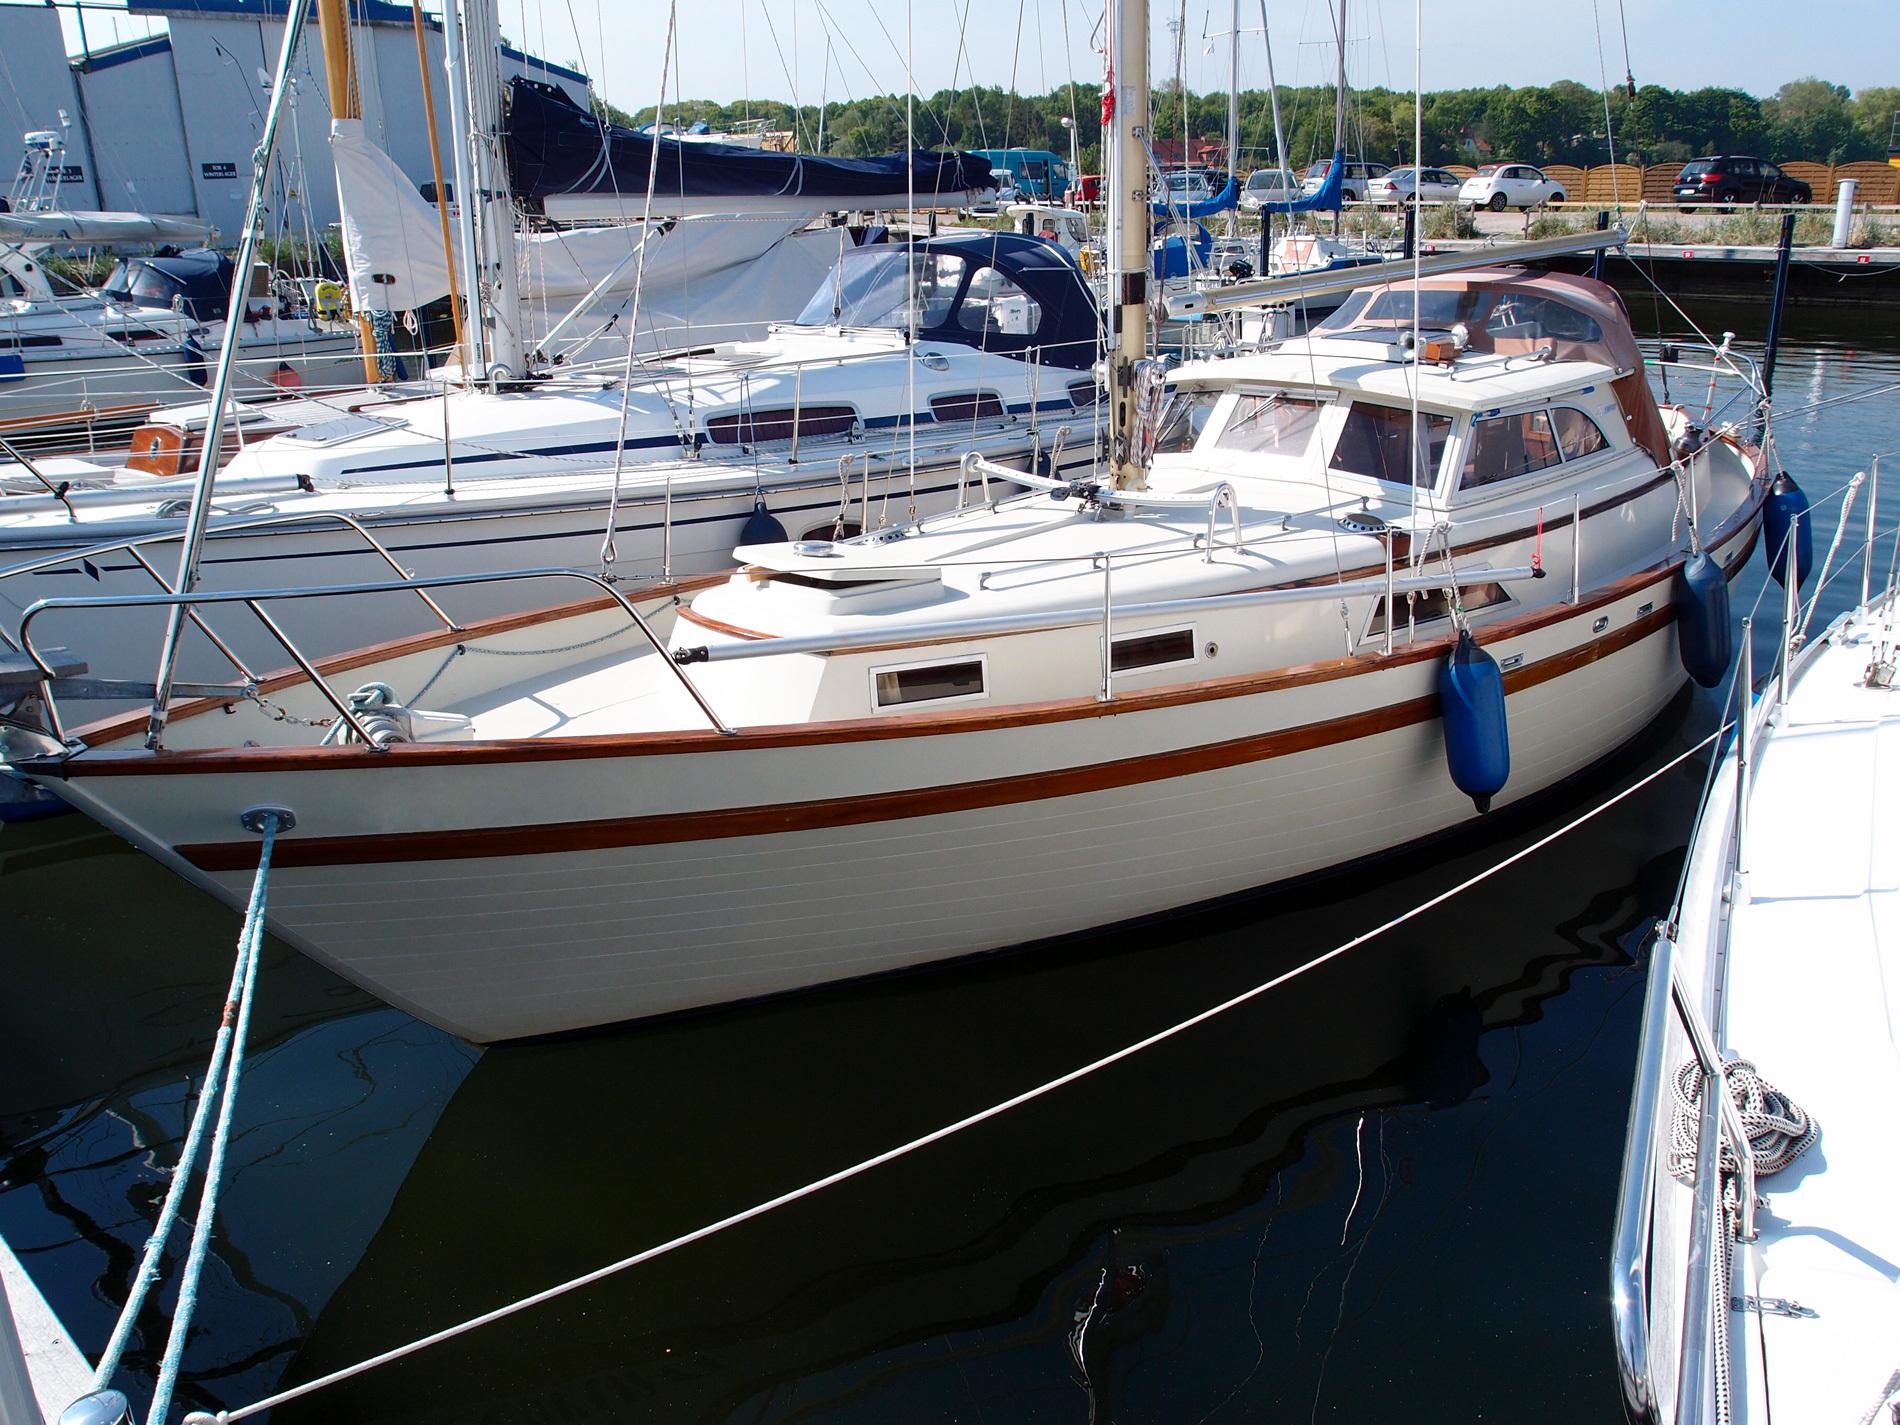 Fjord 33 Fjord Ms 33